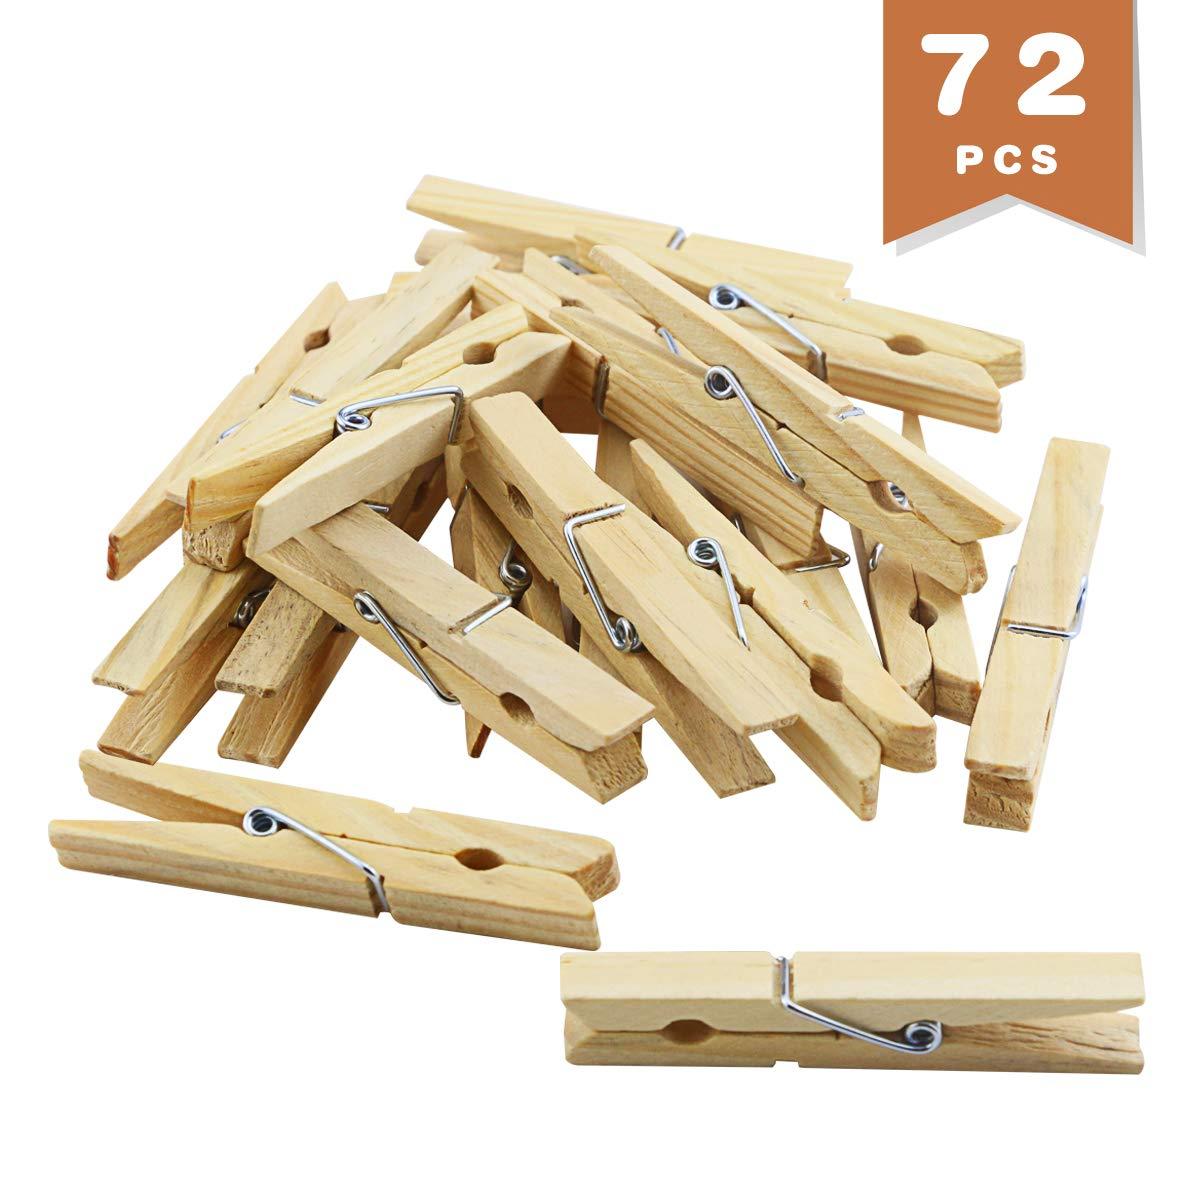 Wlnner 大型木製洗濯ばさみ 72個 2.8インチ 木製アートクラフト 写真吊り下げクリップ シャツ/シーツ/パンツ/装飾用洗濯ばさみ B07R3JK7BP